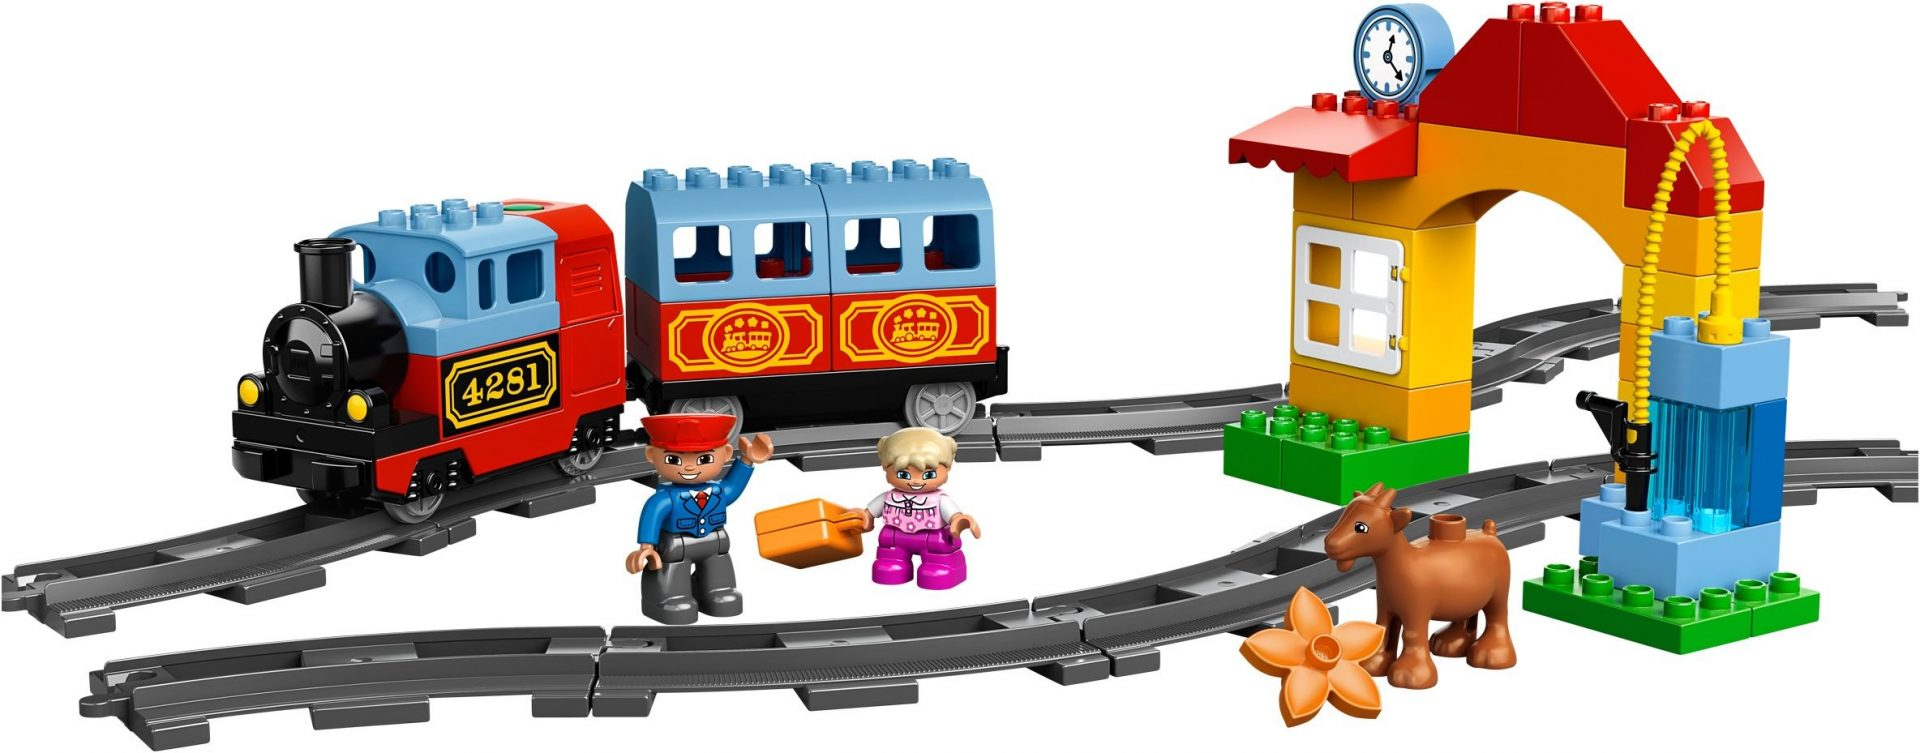 Lego Duplo 10507 Ensimmäinen Junani